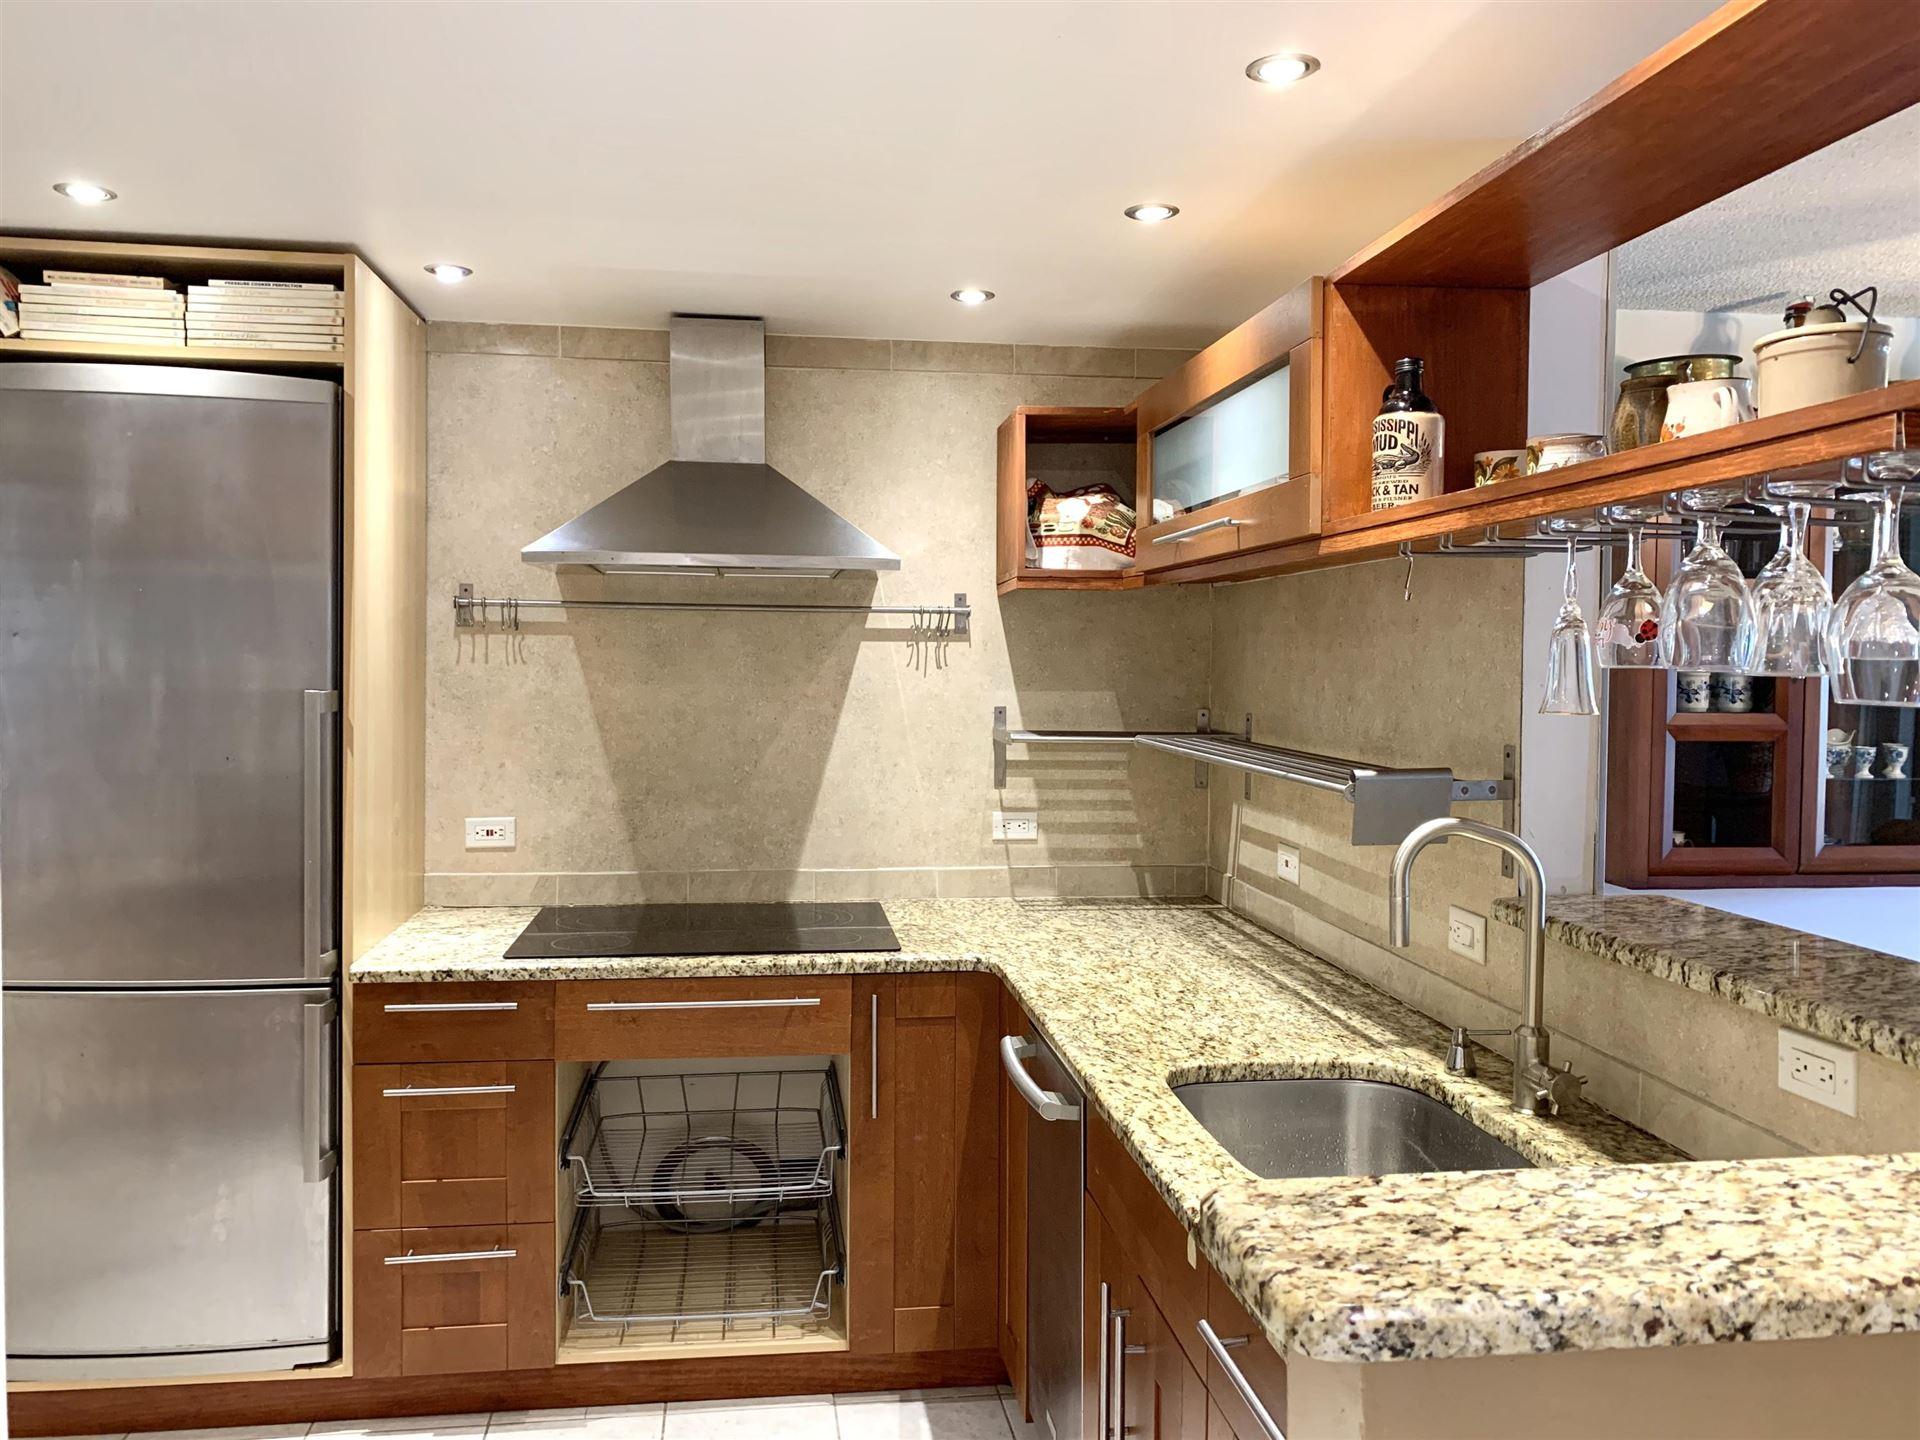 299 NW 52nd Terrace #4200, Boca Raton, FL 33487 - #: RX-10626466